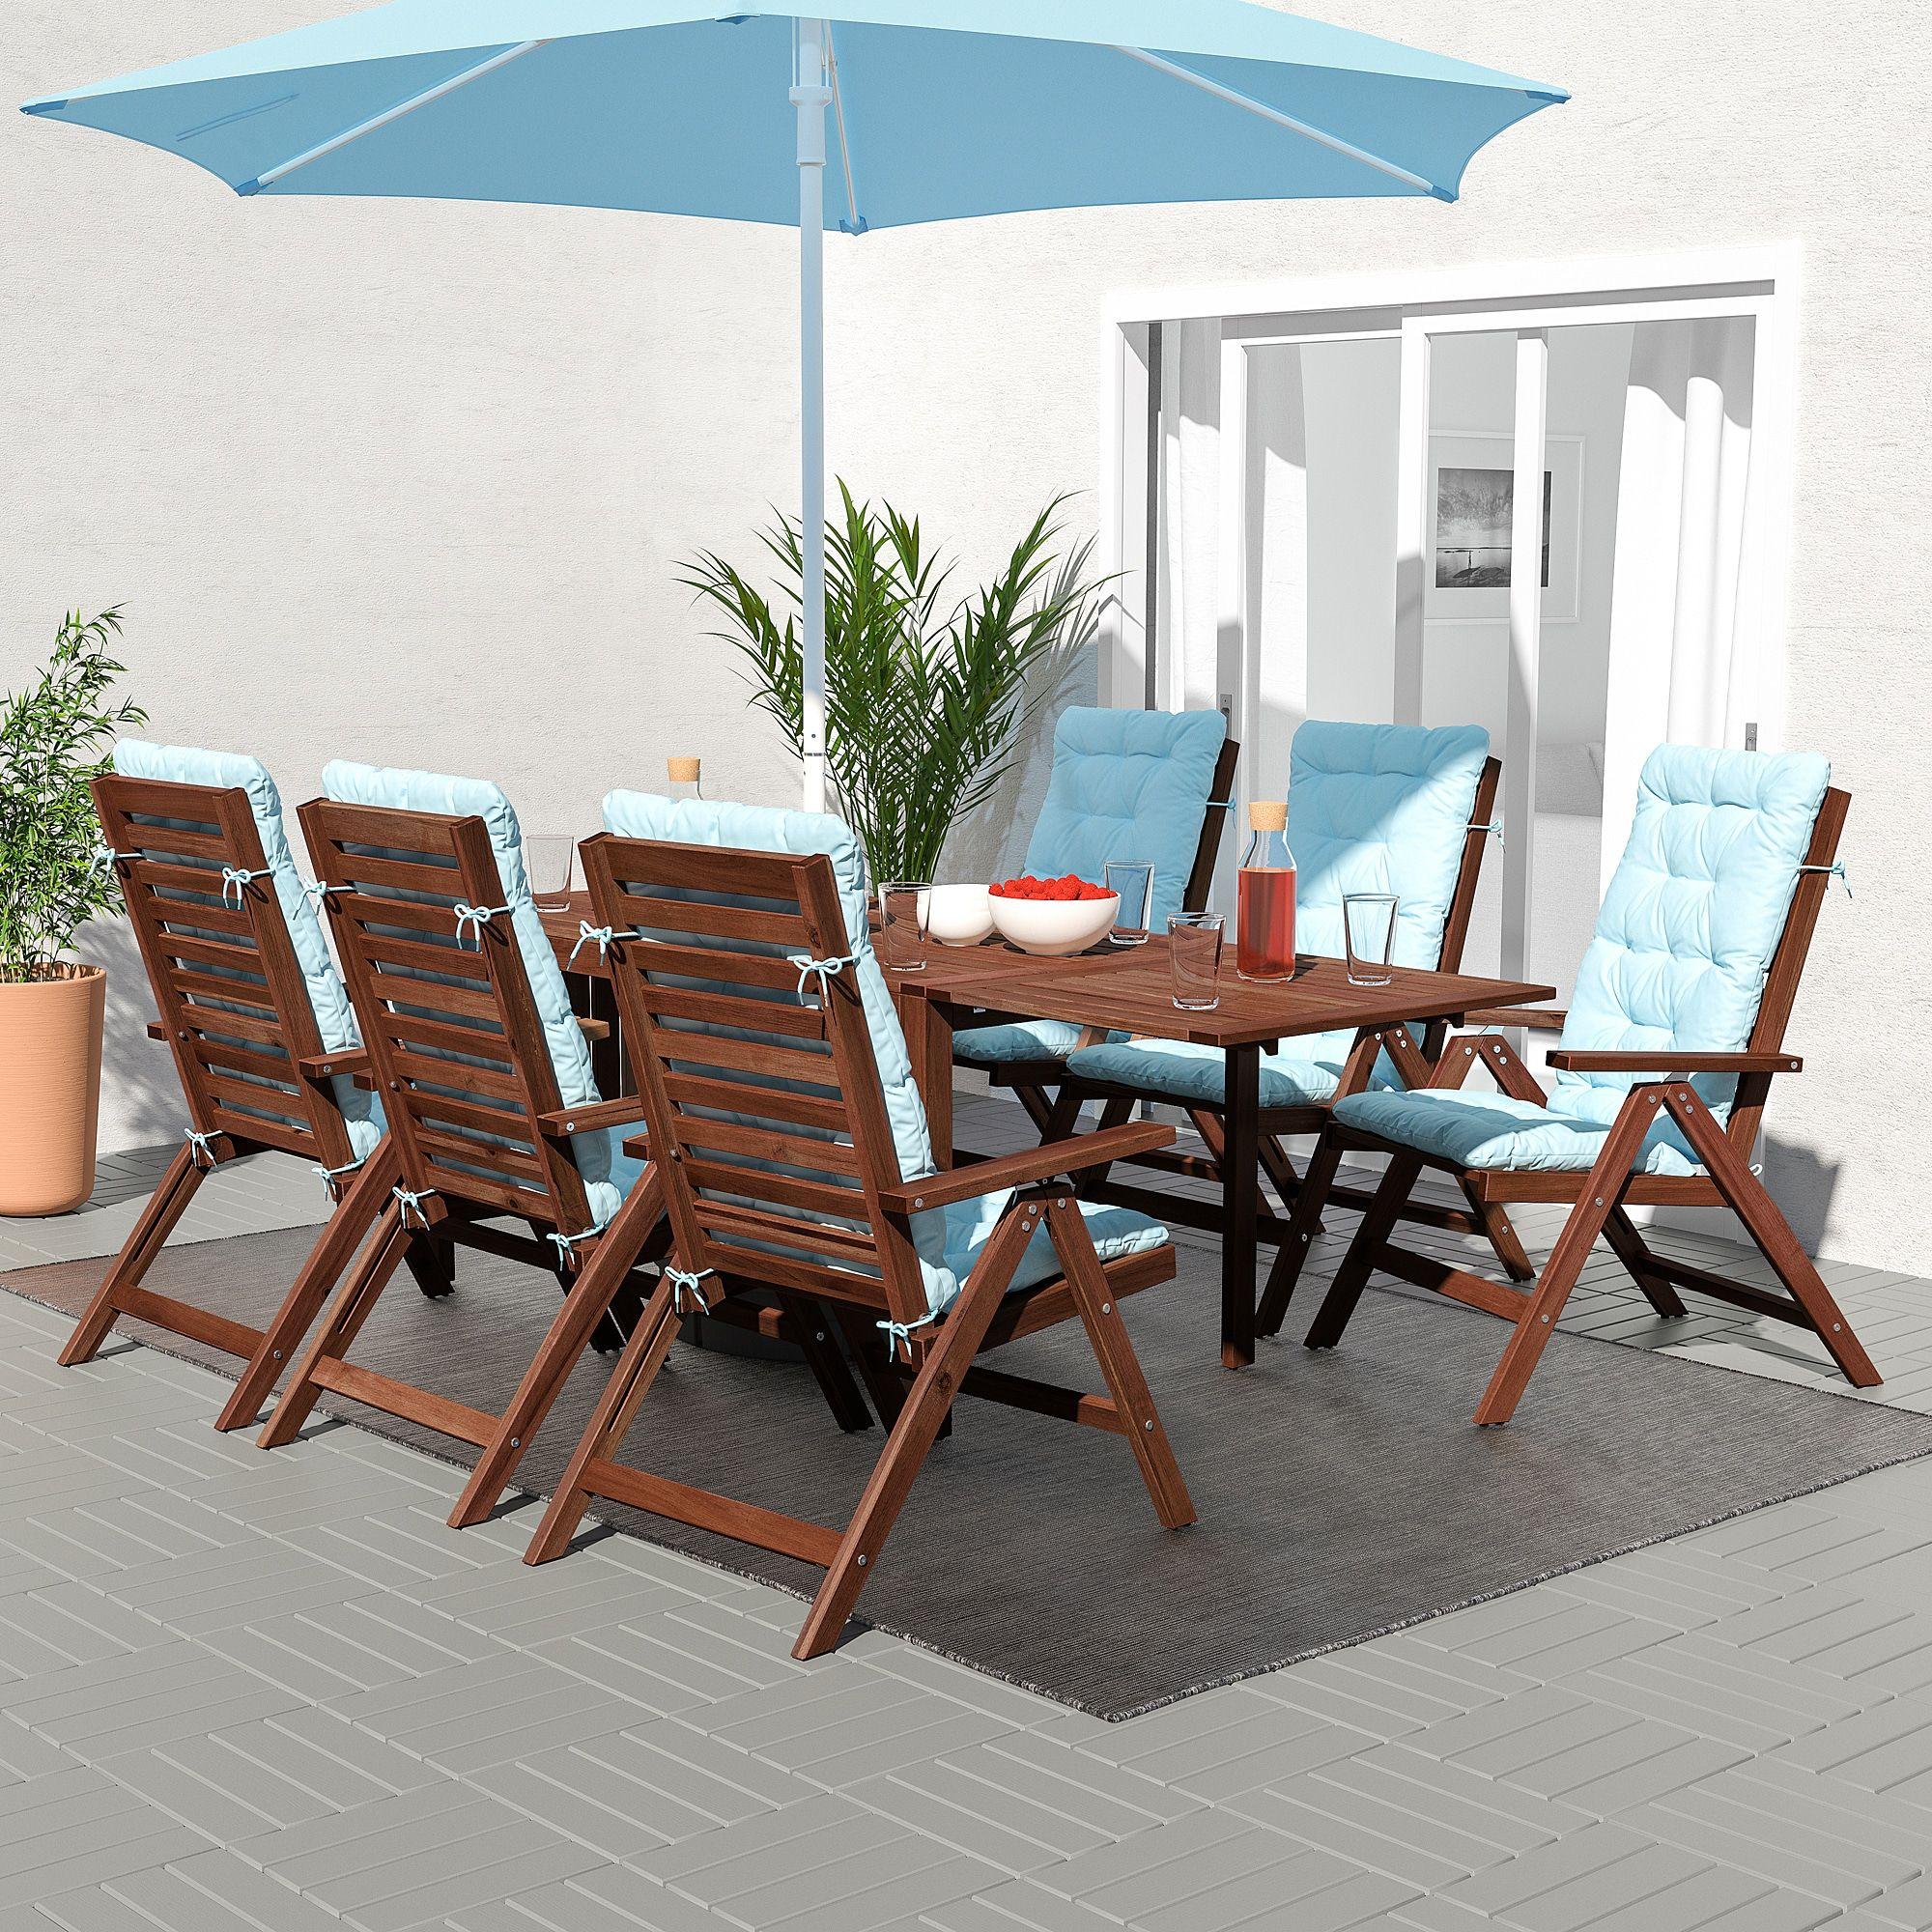 Sensational Ikea Applaro Brown Stained Kuddarna Light Blue Table 6 Machost Co Dining Chair Design Ideas Machostcouk